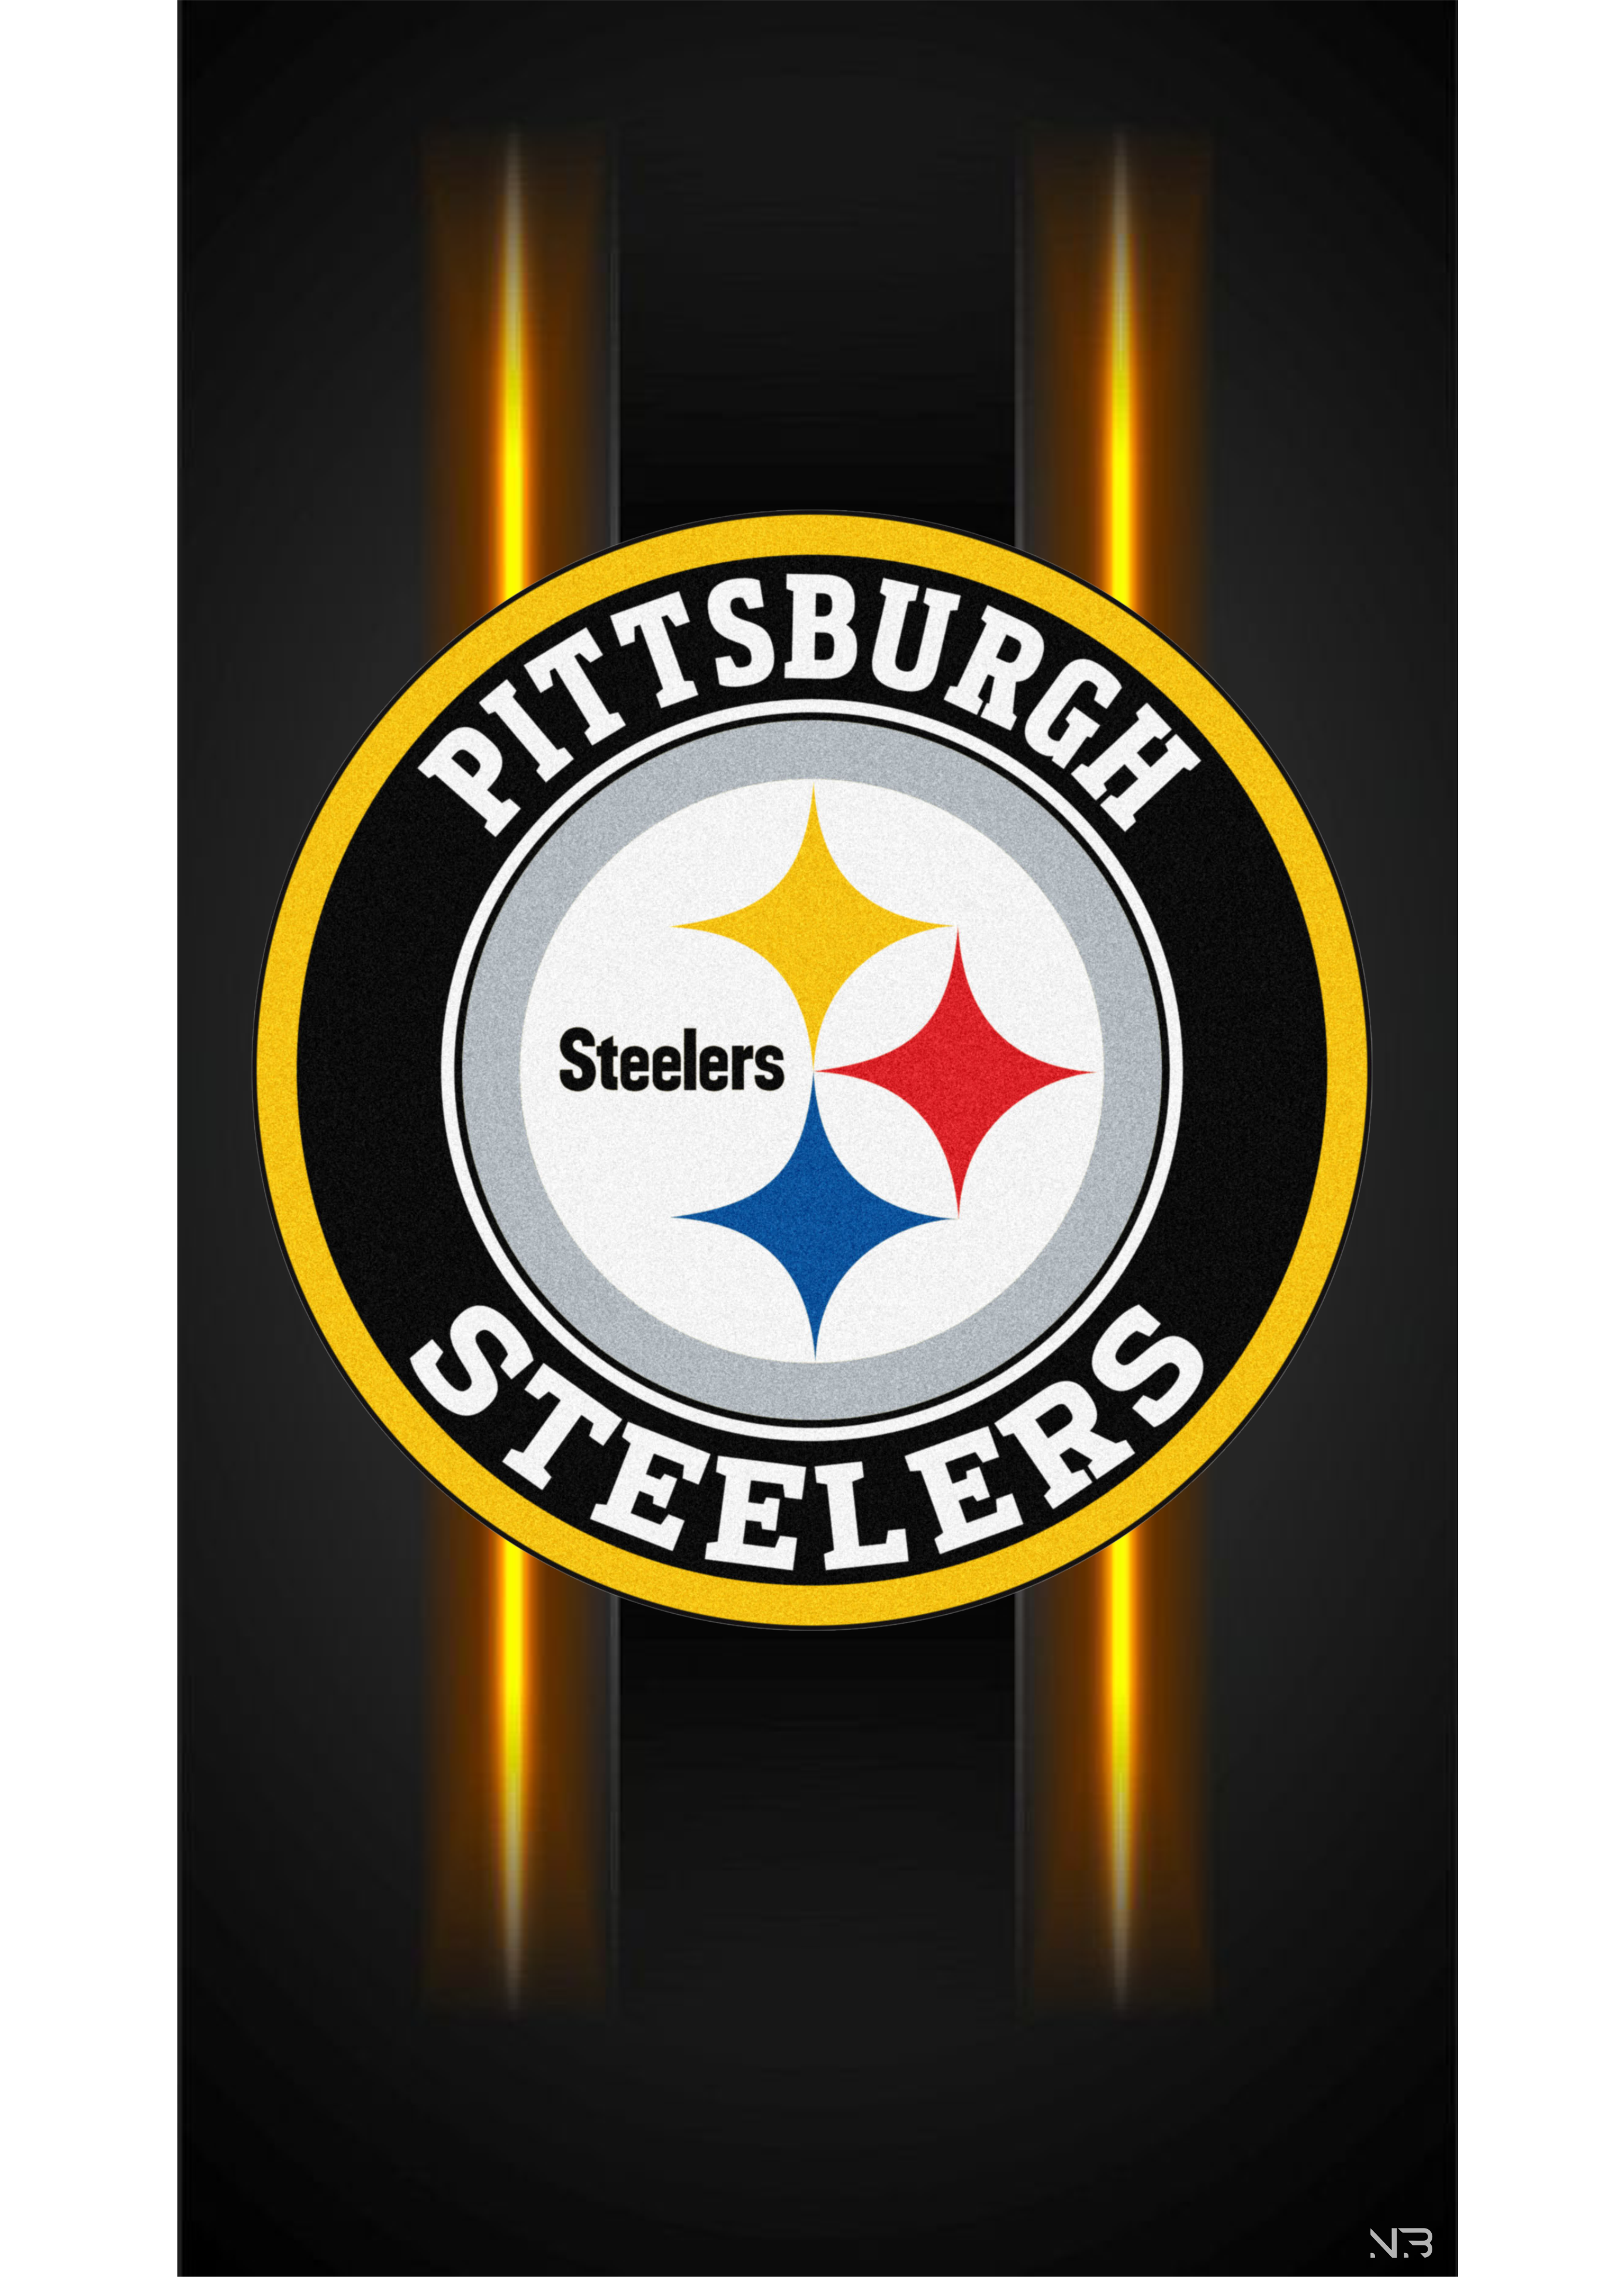 Pittsburgh Steelers Logo Png Transparent Svg Vector Freebie Supply Pittsburgh Steelers Logo Pittsburgh Steelers Steelers